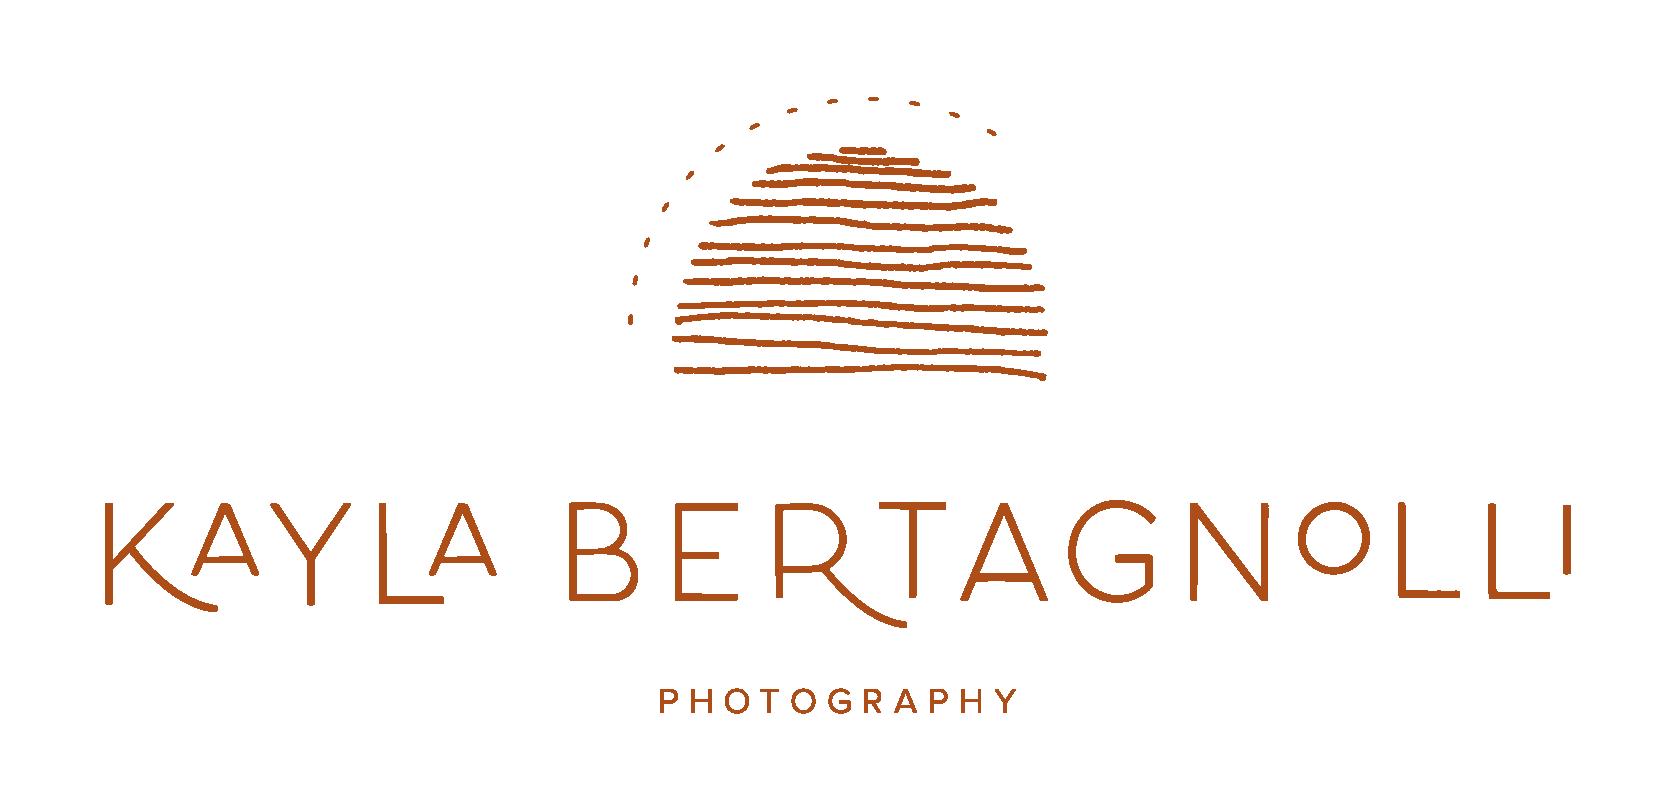 Kayla Bertagnolli Photography